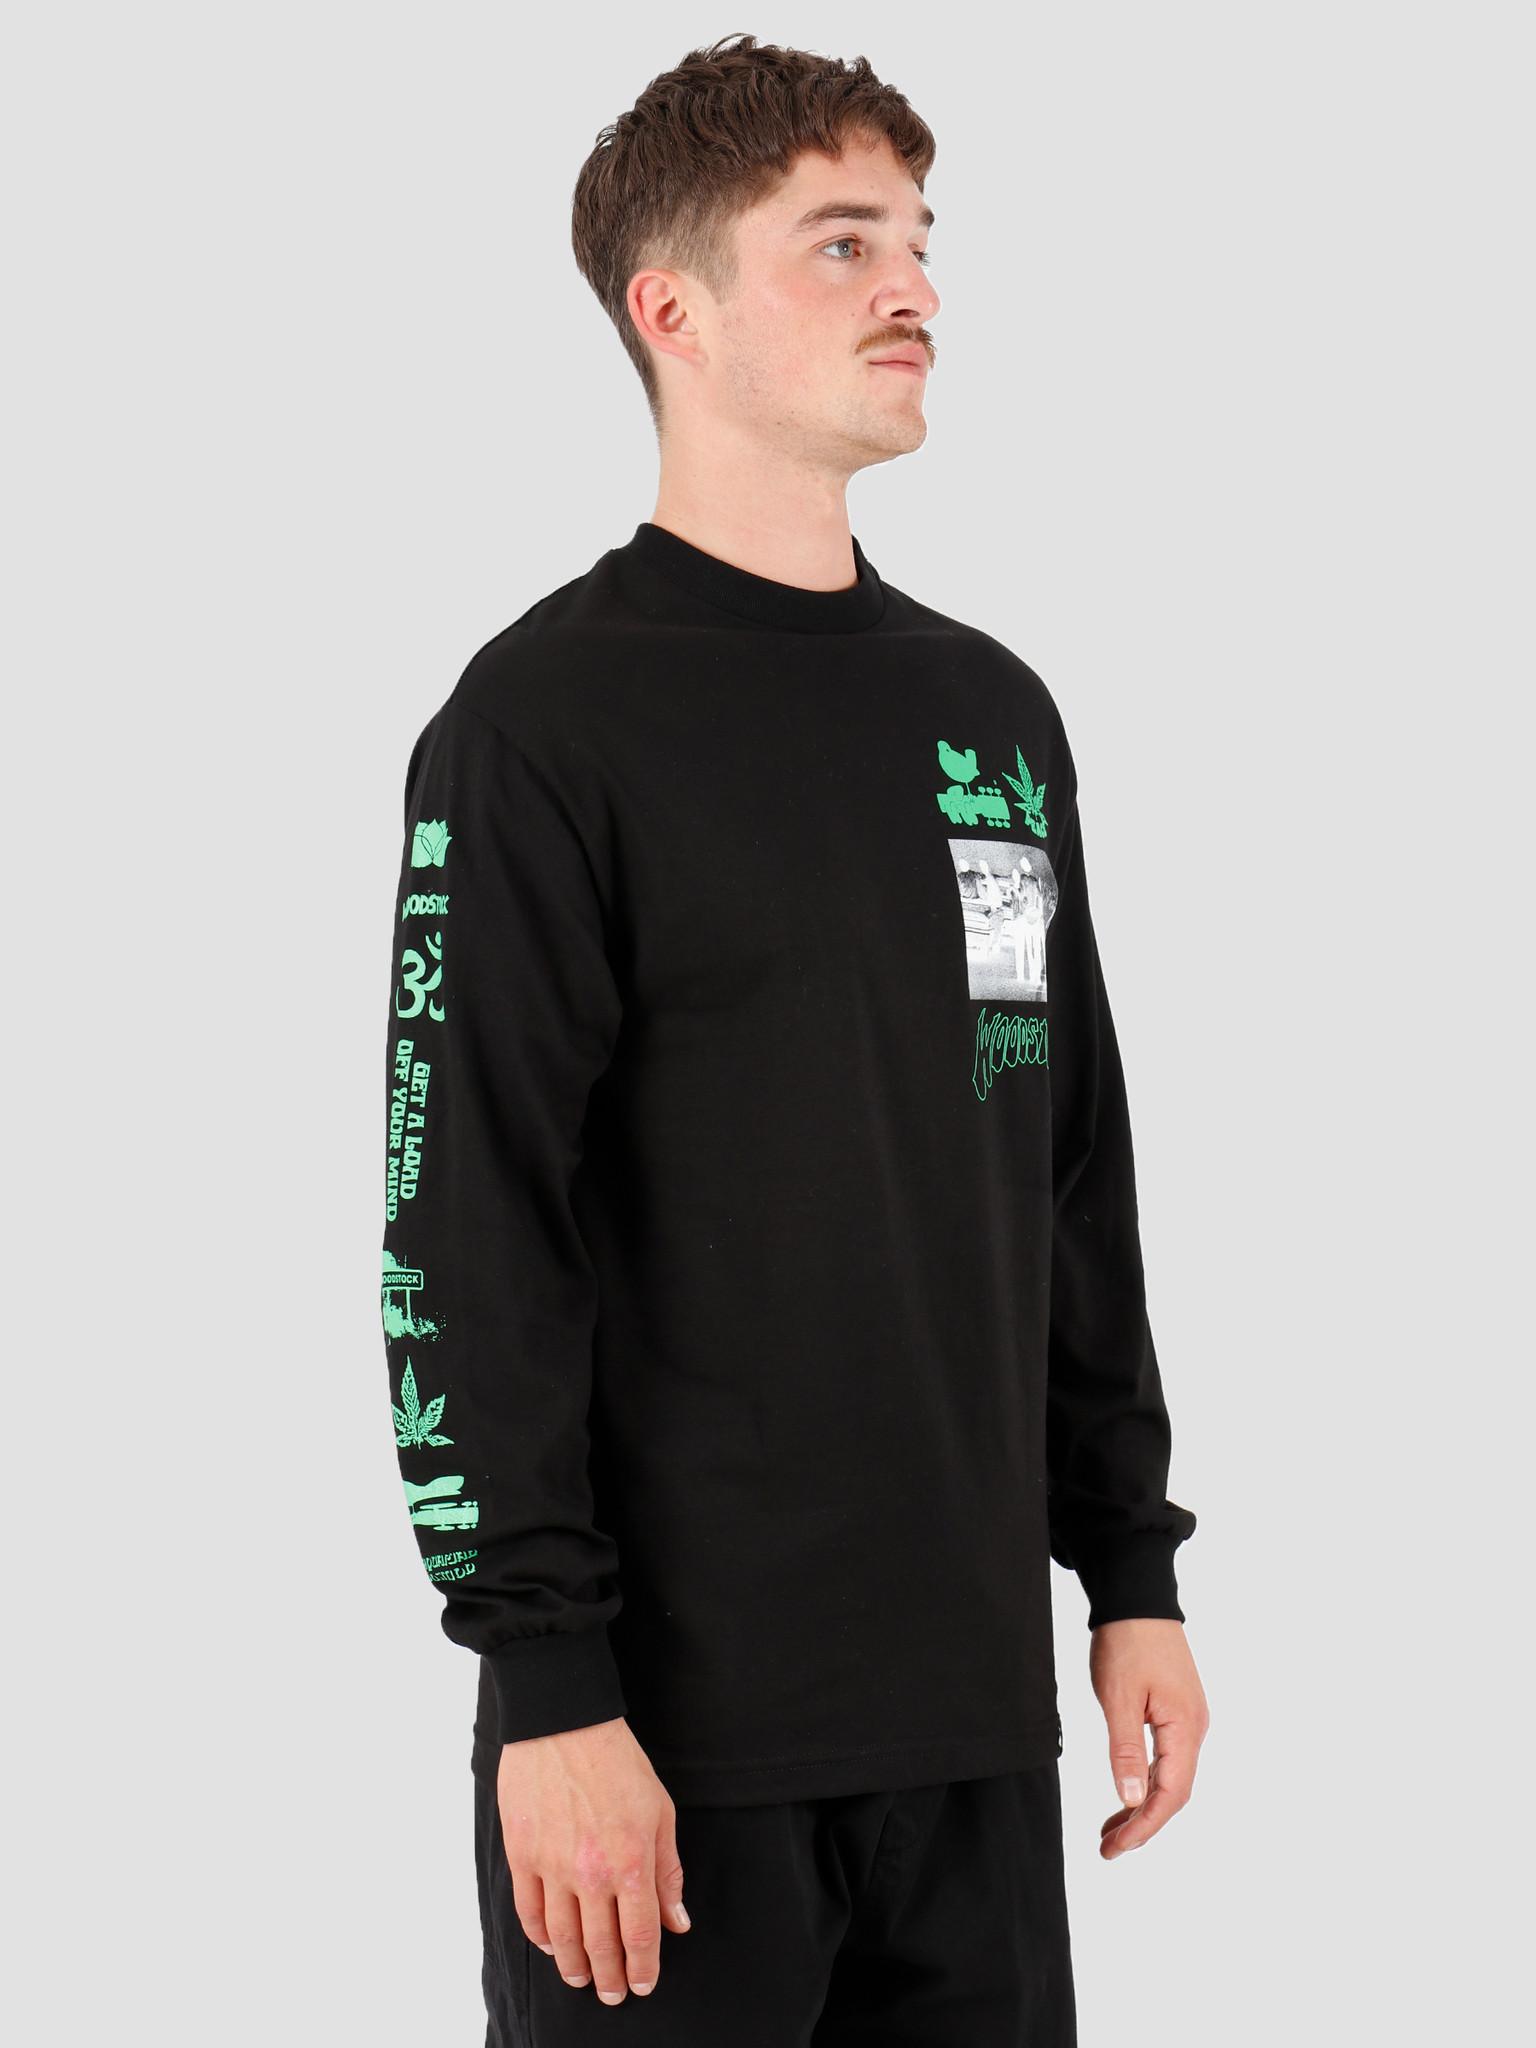 HUF HUF Woodstock Loaded Longsleeve T-Shirt Black TS00977